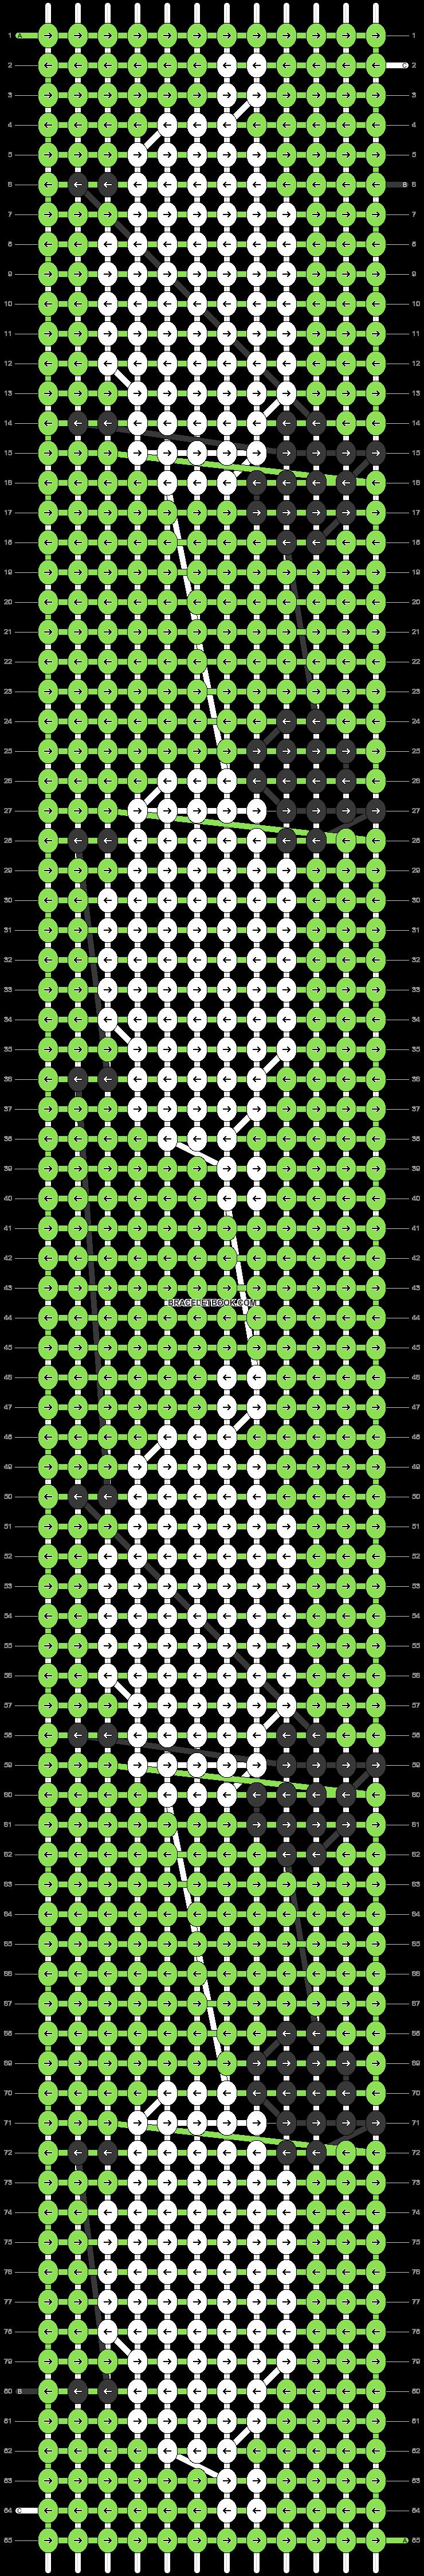 Alpha pattern #21640 pattern